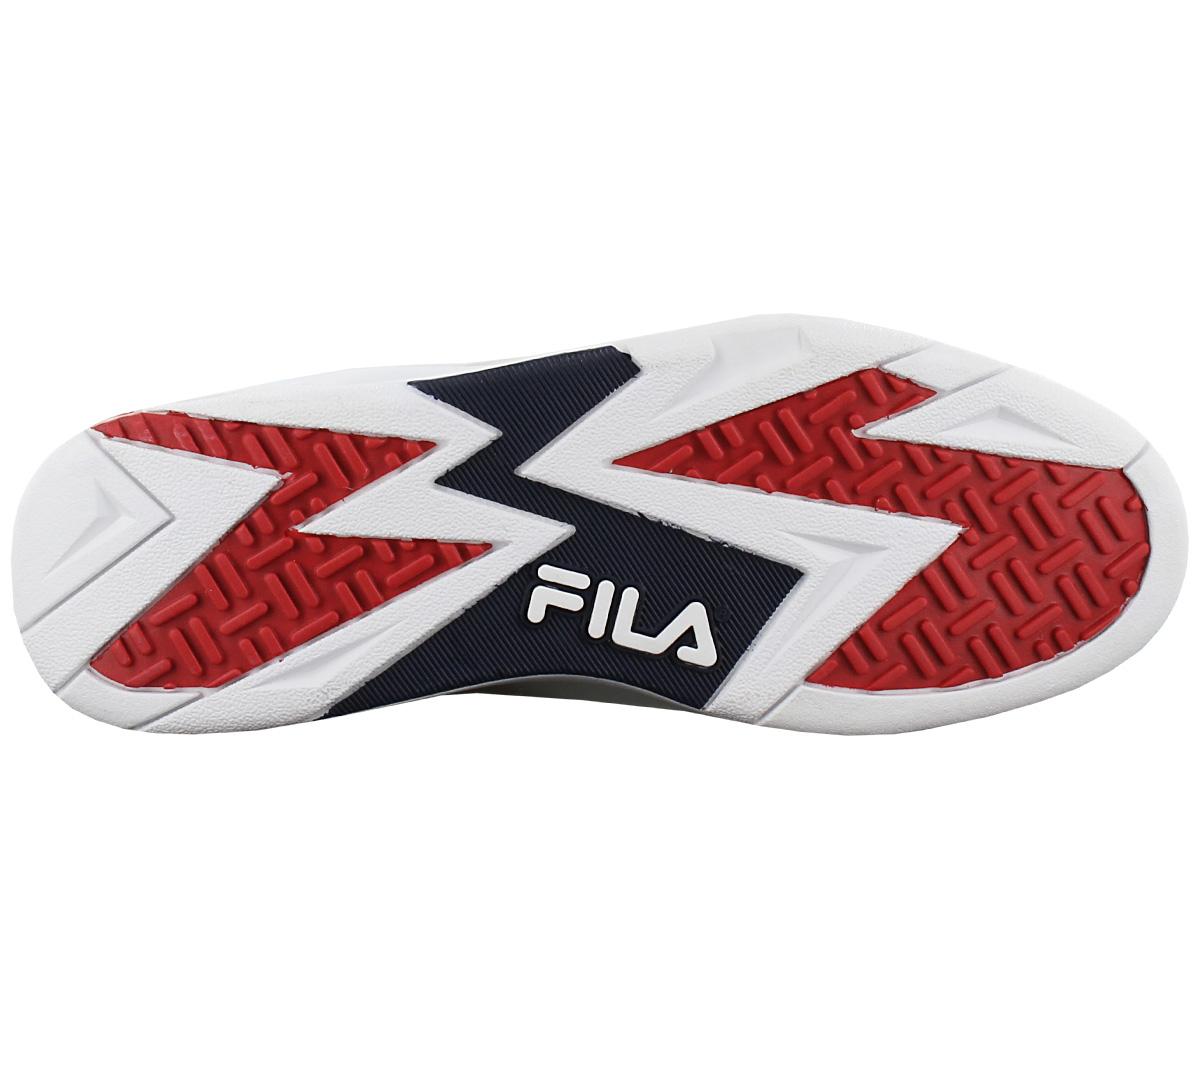 Details about Fila the Cage 17 Men's Sneaker Shoes Sneakers 1BM00026 125 Sport Shoe White